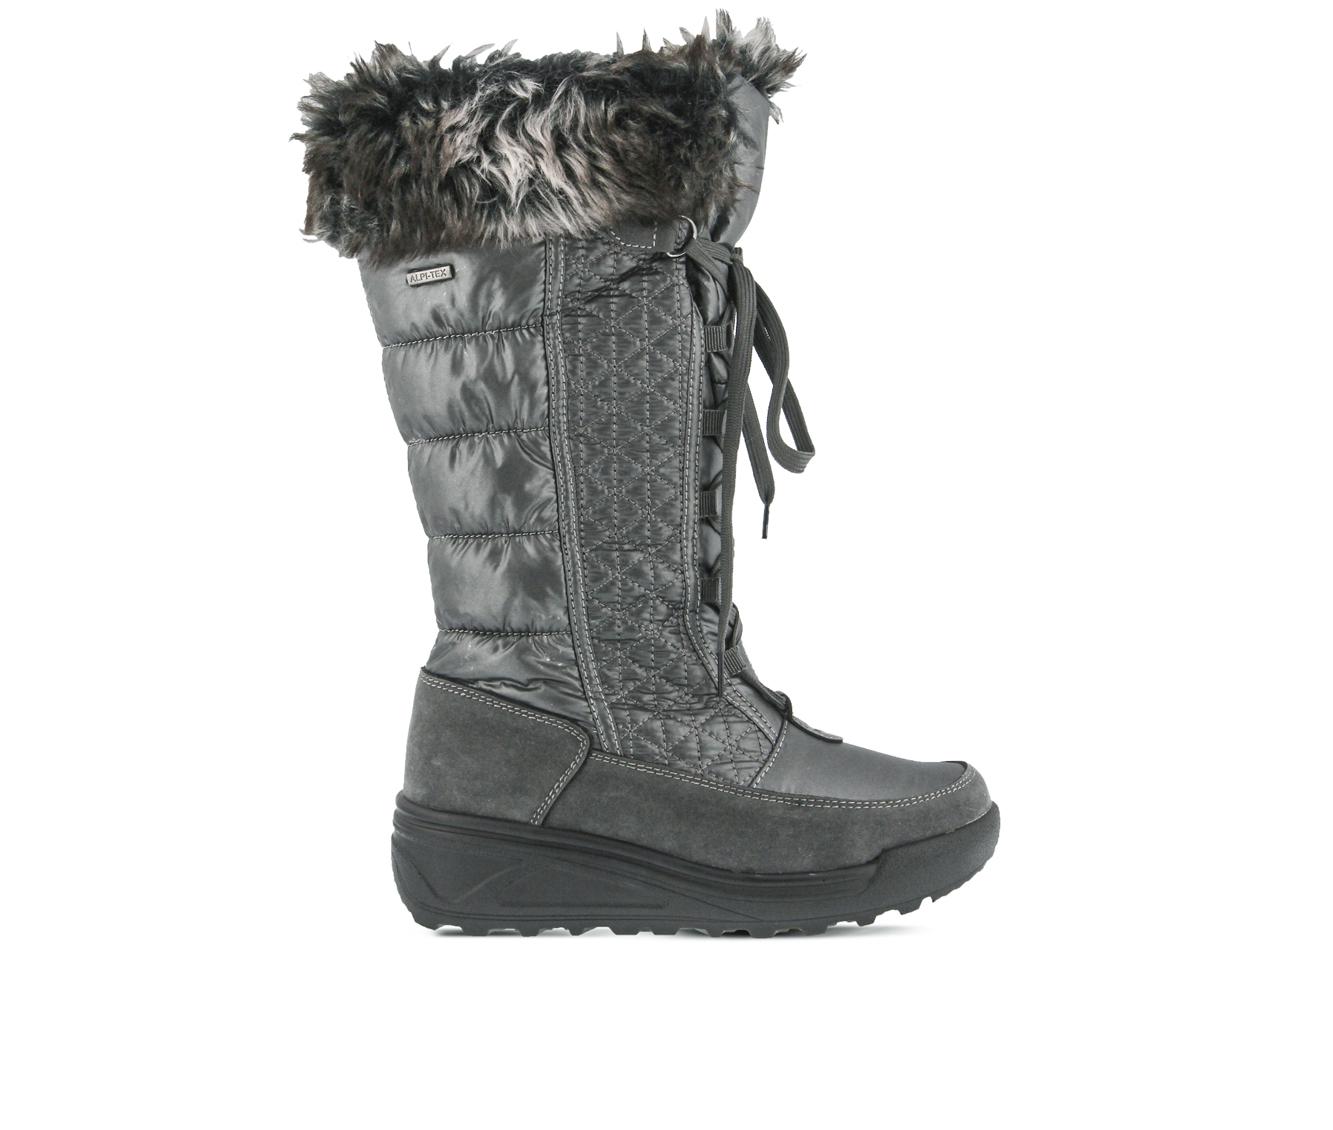 Flexus Fotios Women's Boots (Gray Canvas)